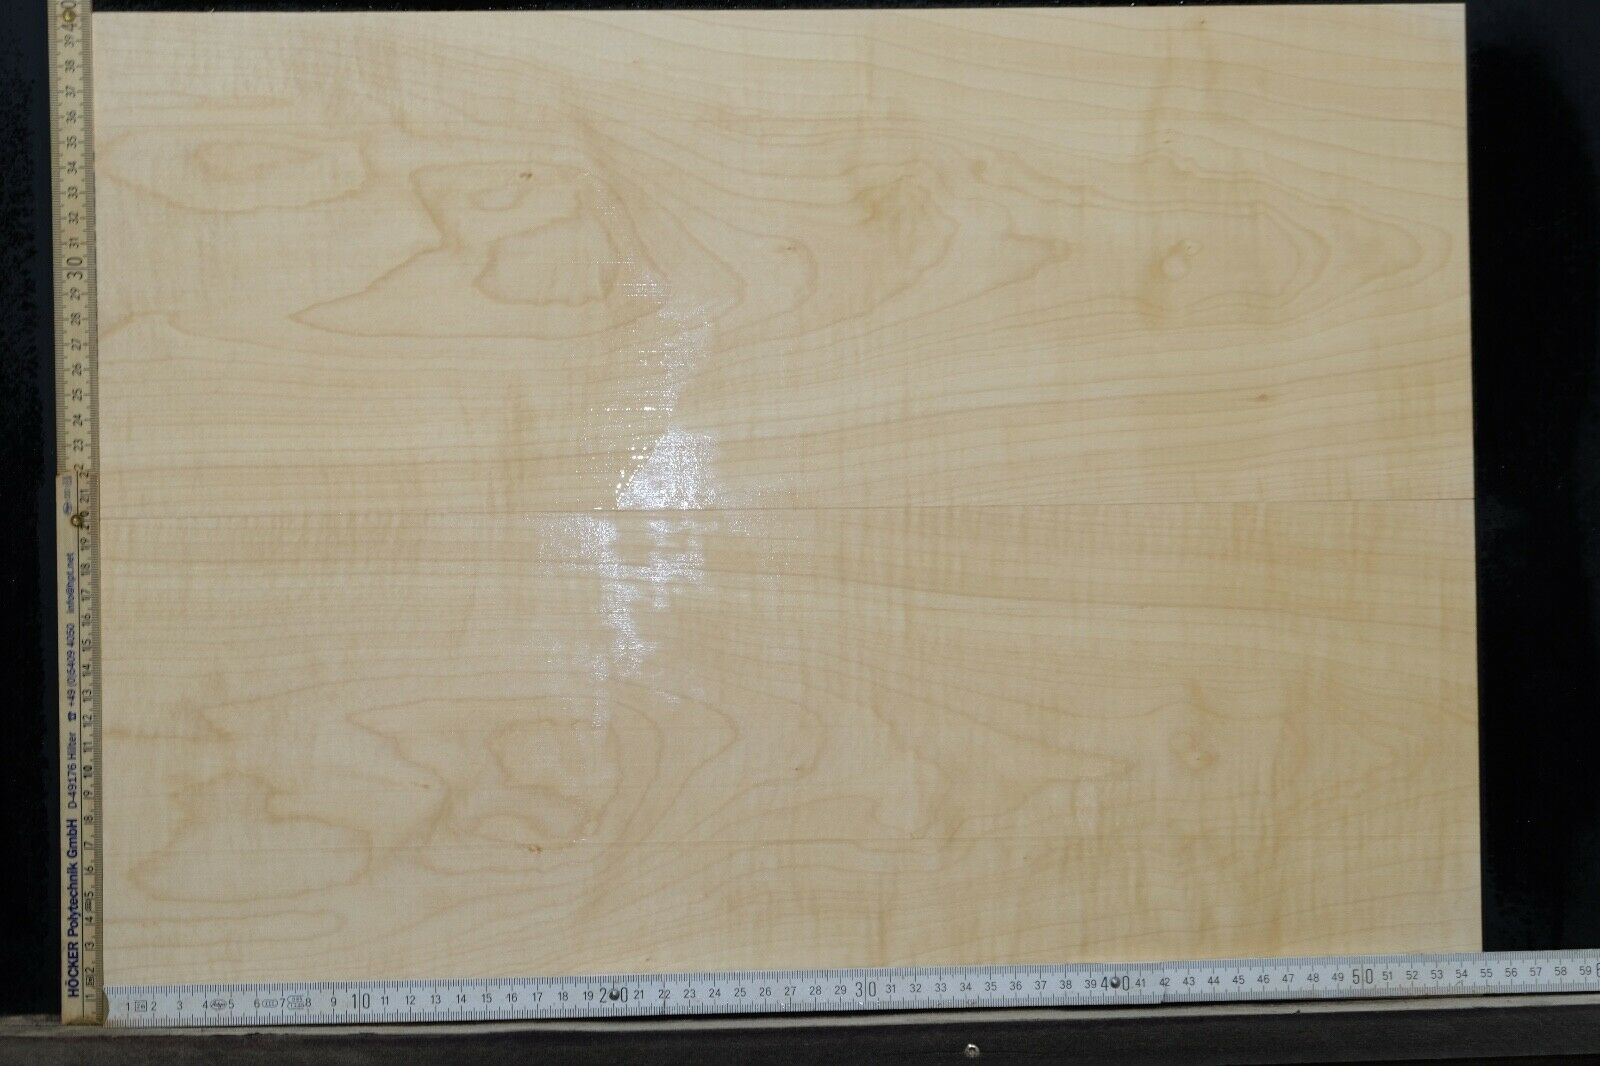 Tonewood Riegel Ahorn Flamed Maple 7,0 mm Aufleimer Guitar Tonholz Droptop 425